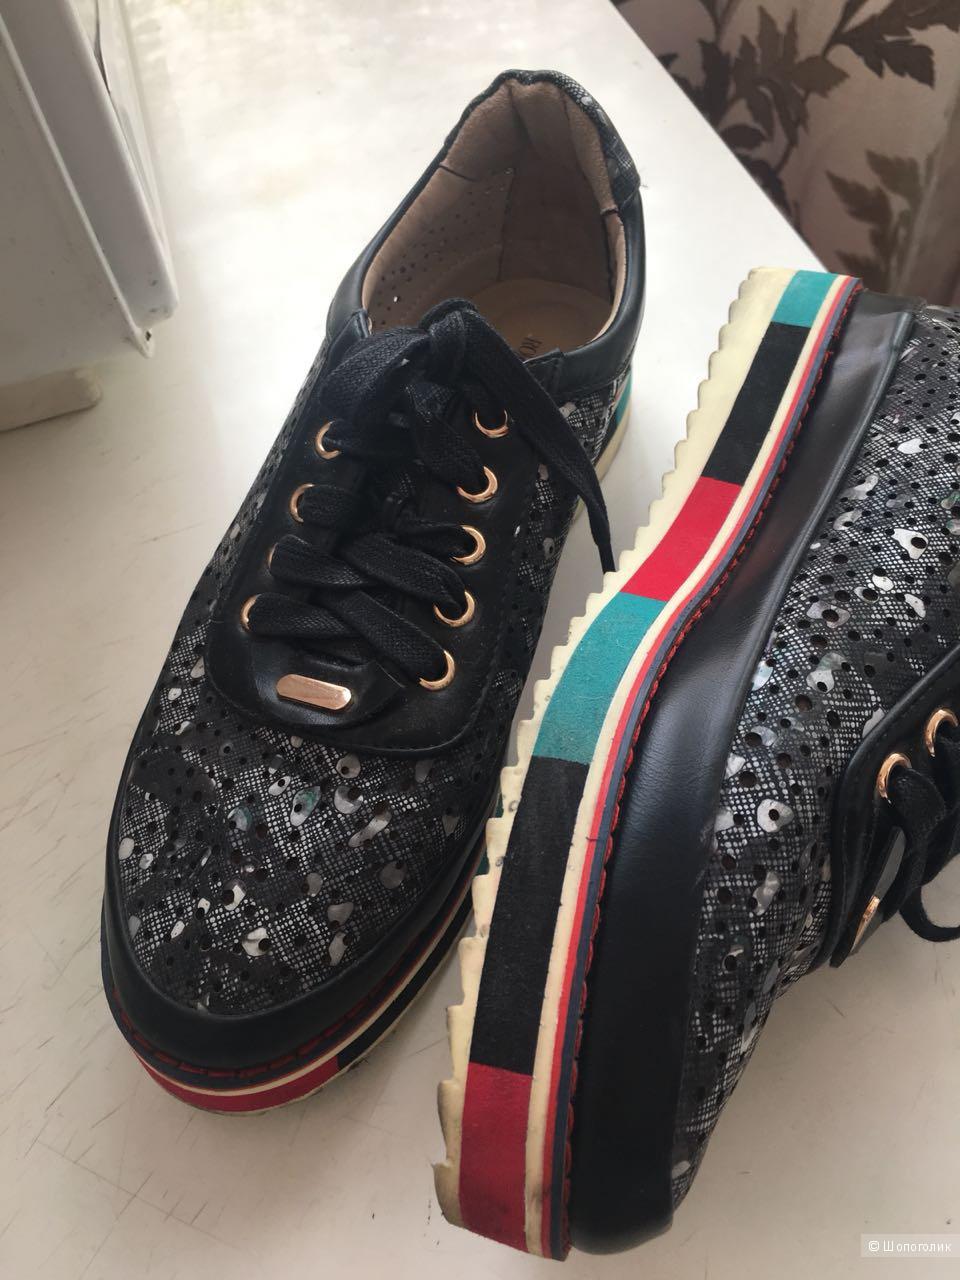 Обувь, ROBERTO PIRALOFF , 39 размер